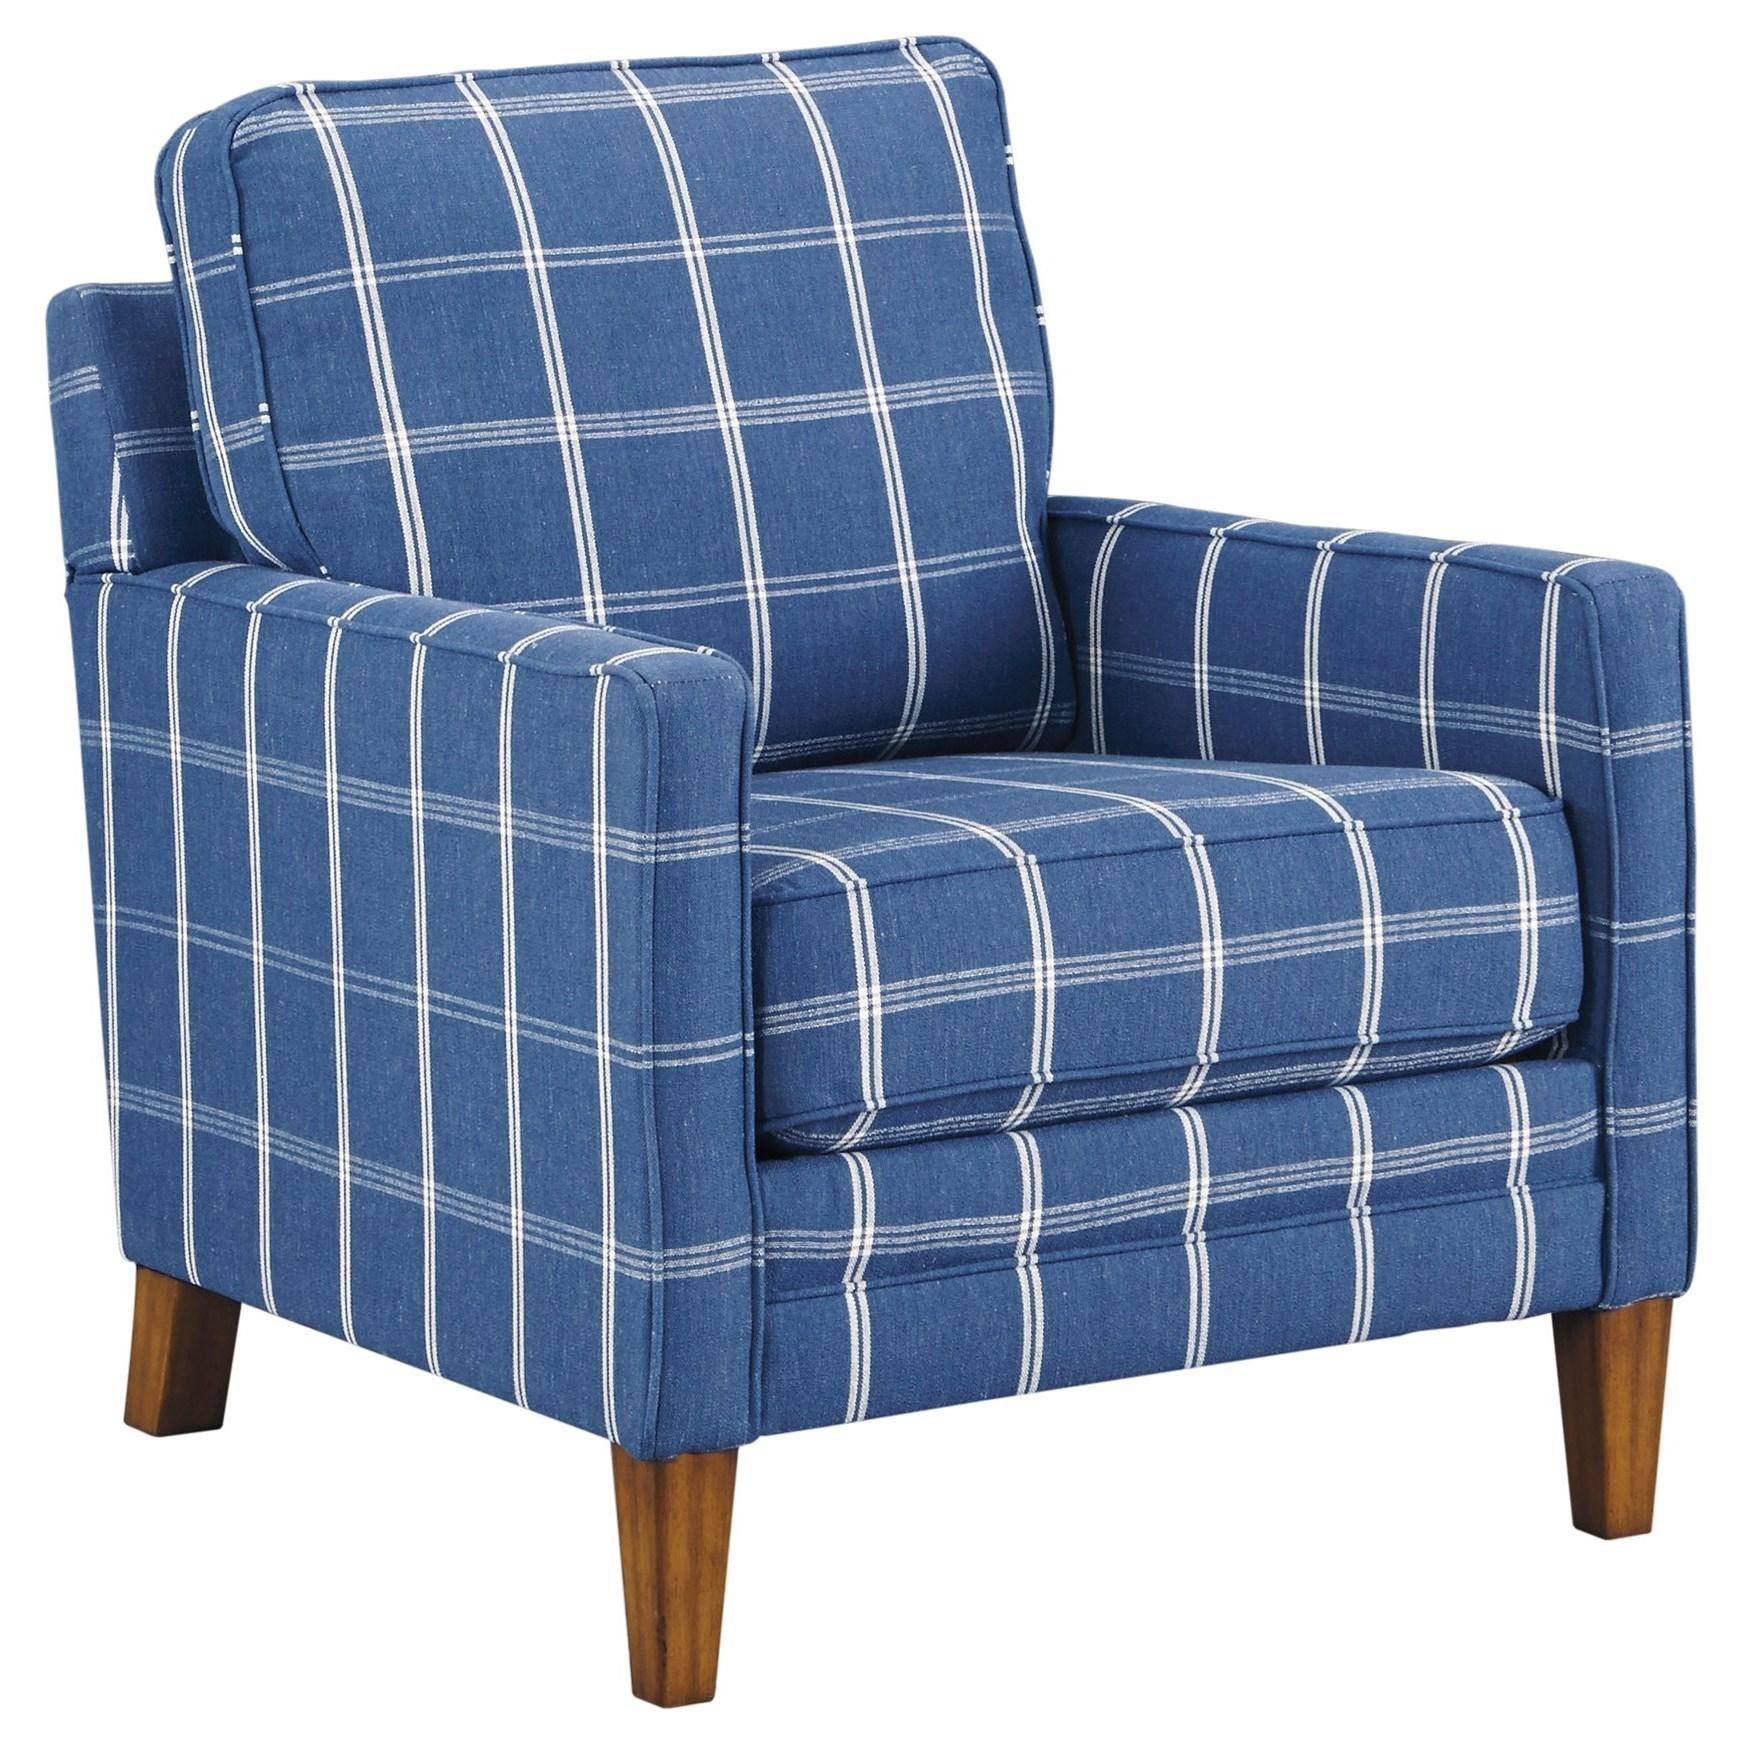 Benchcraft Adderbury Accent Chair - Item Number: 1440321